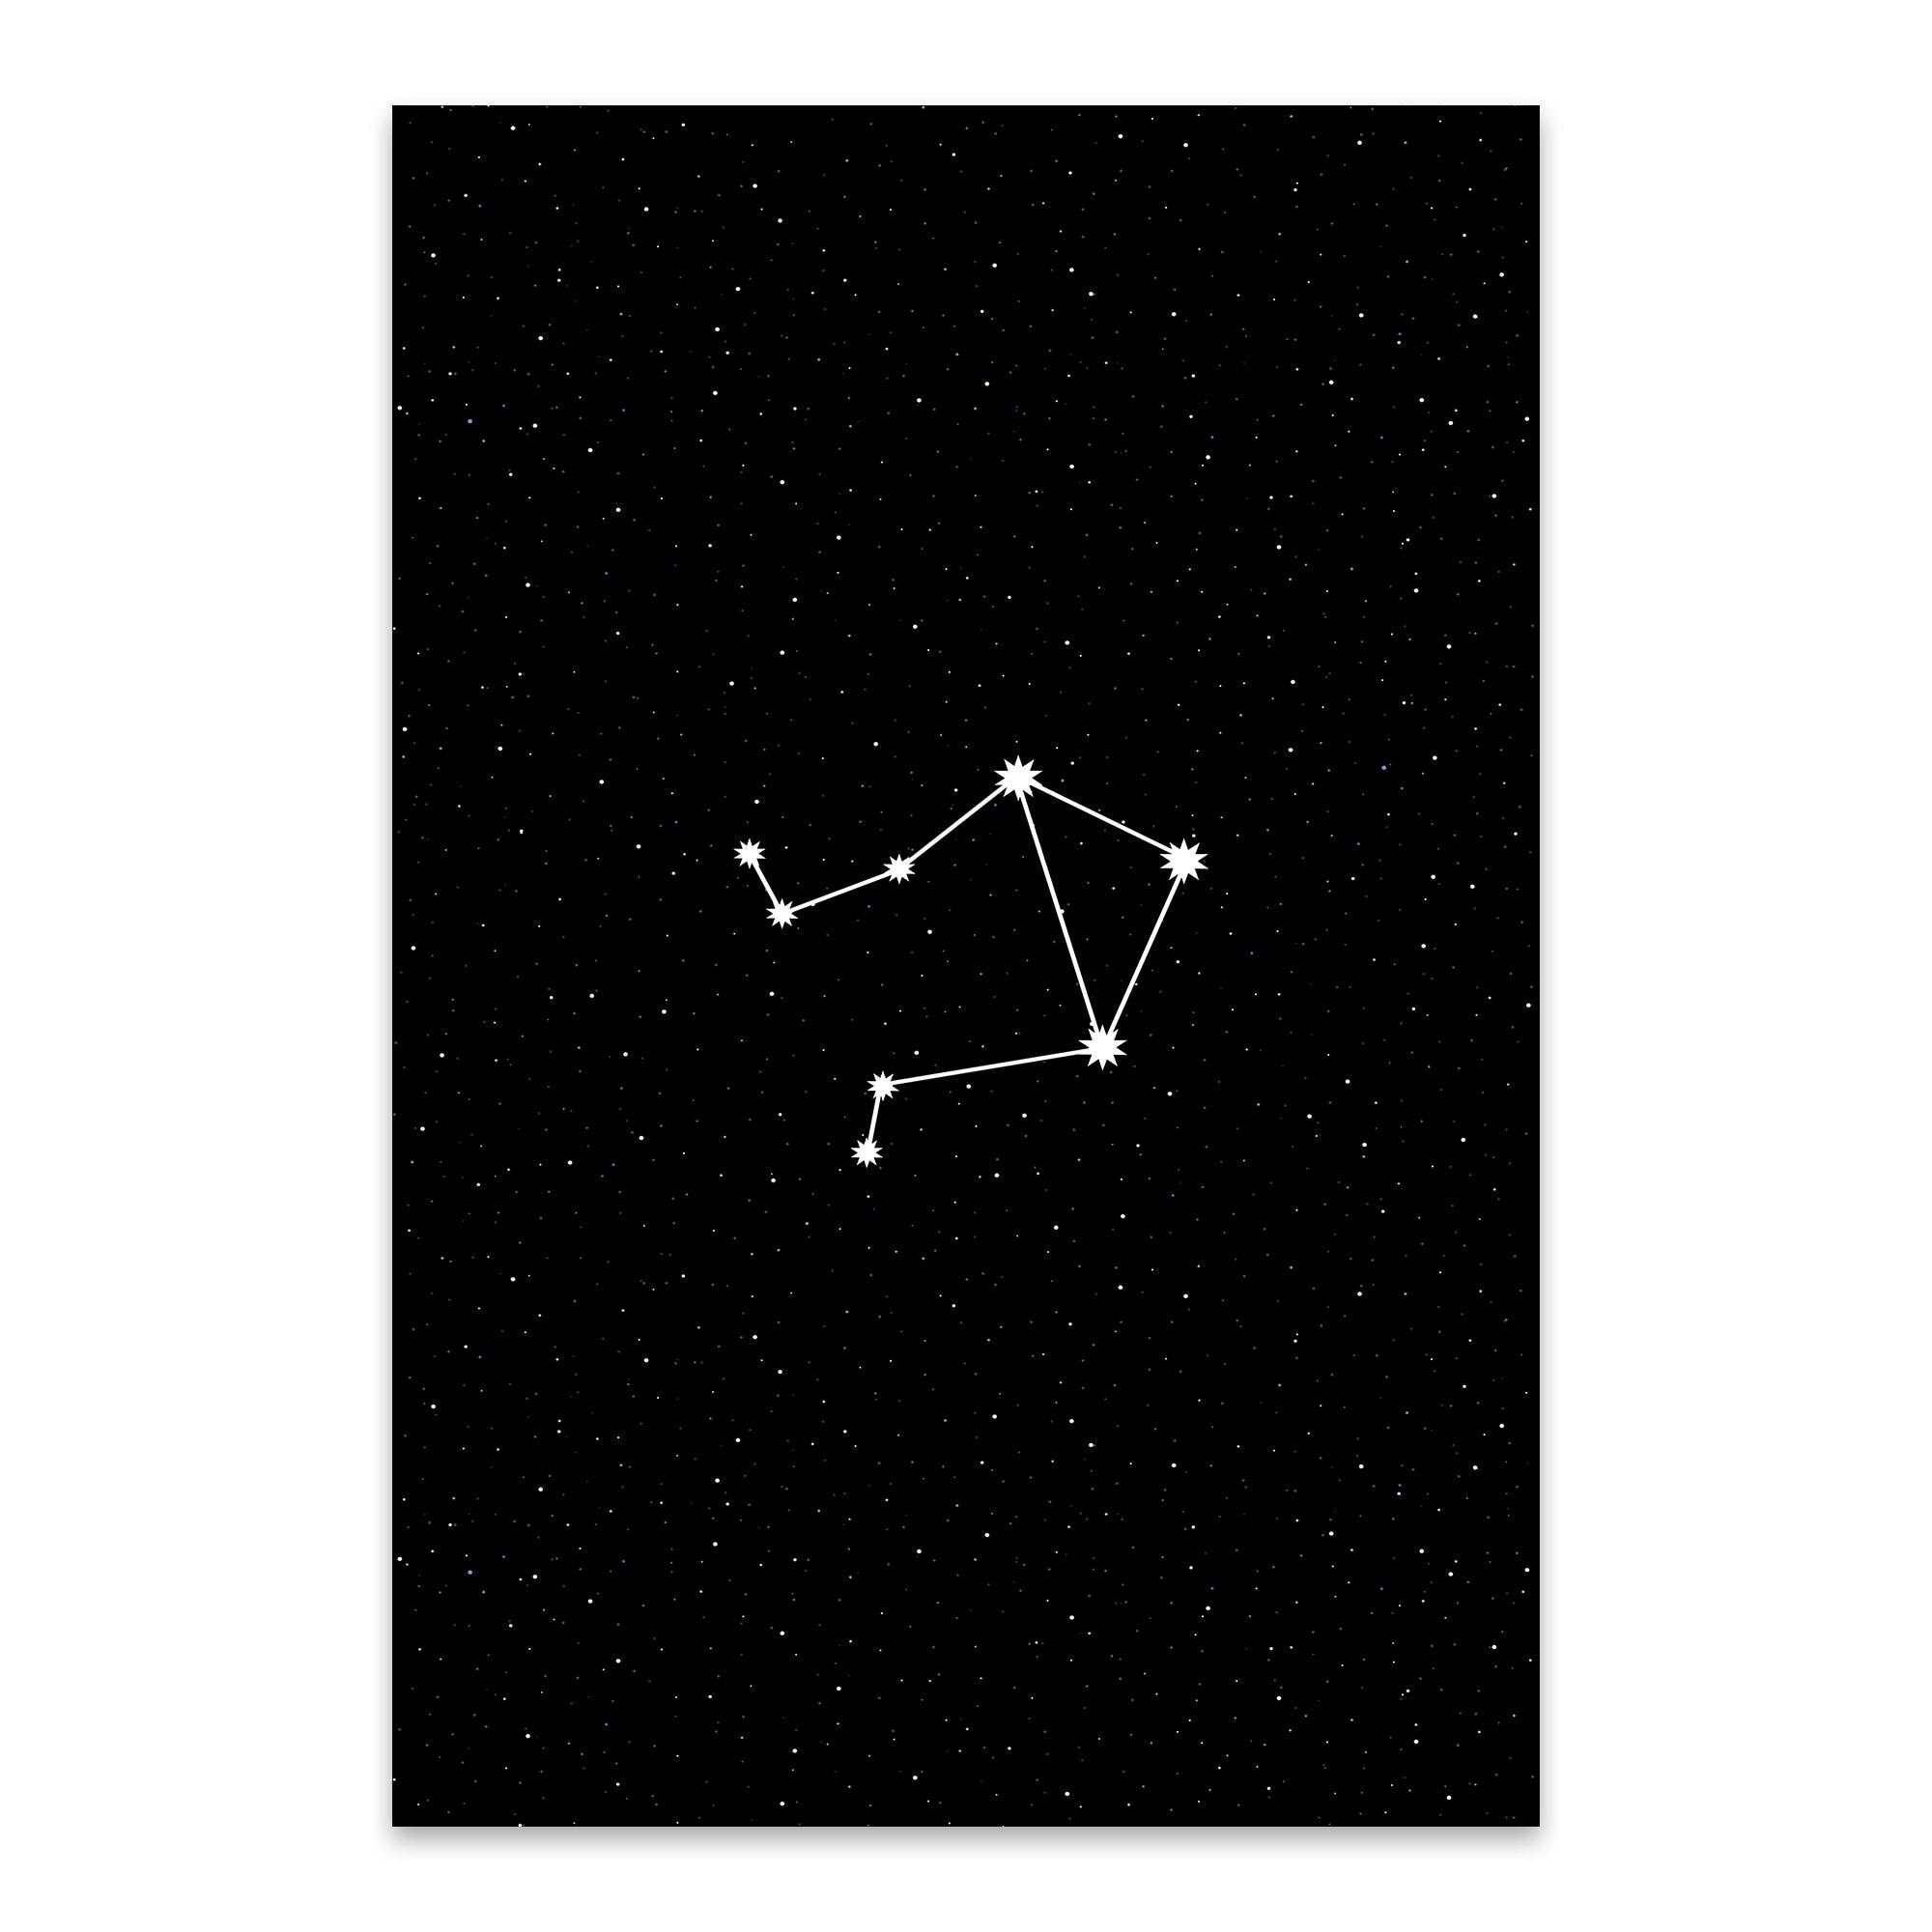 Noir gallery night sky libra astrology zodiac metal wall art print